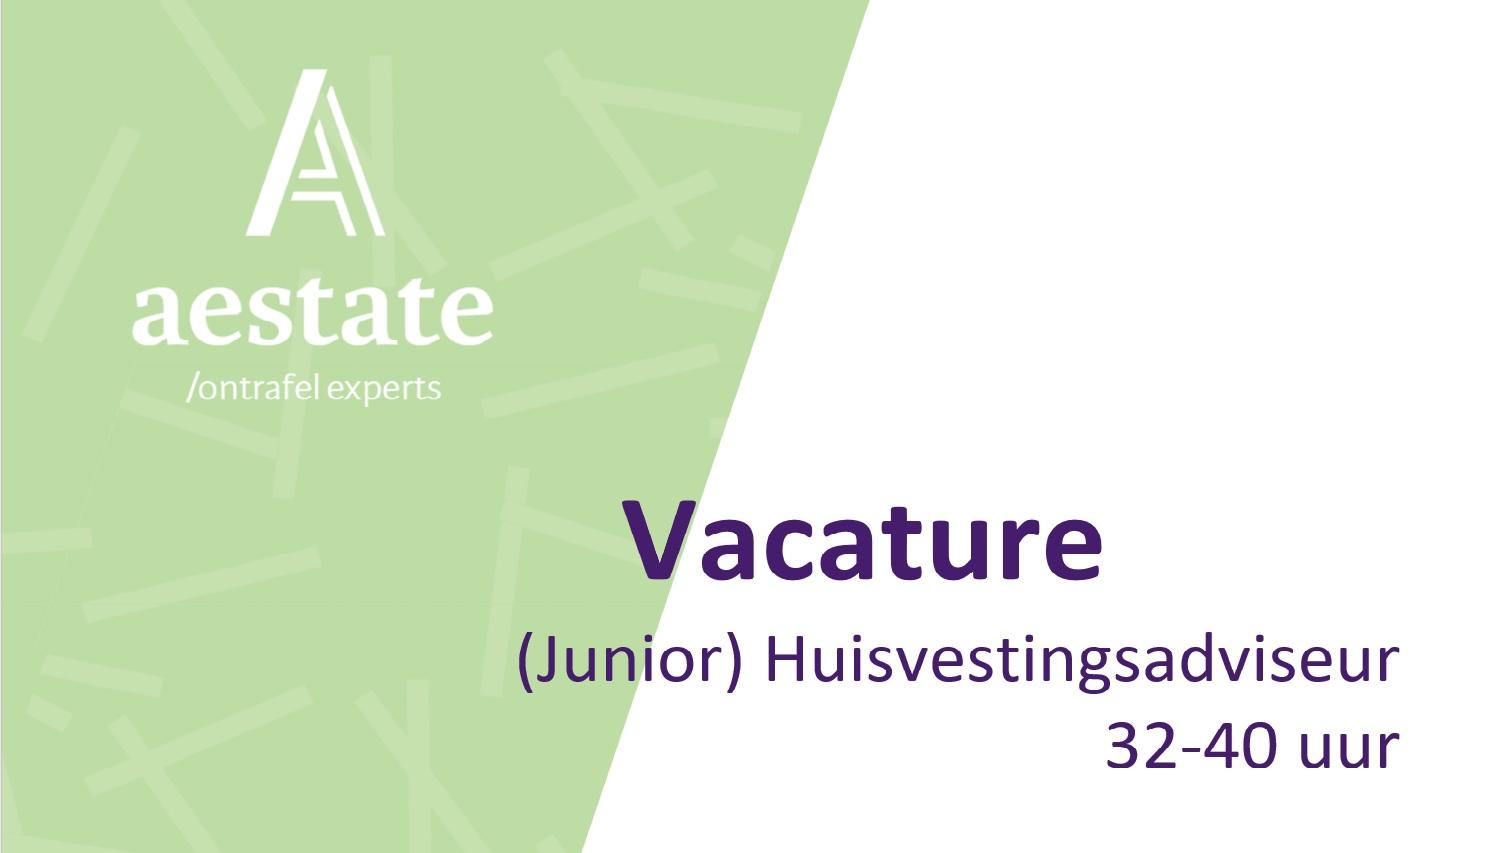 Vacature: (Junior) Huisvestingsadviseur